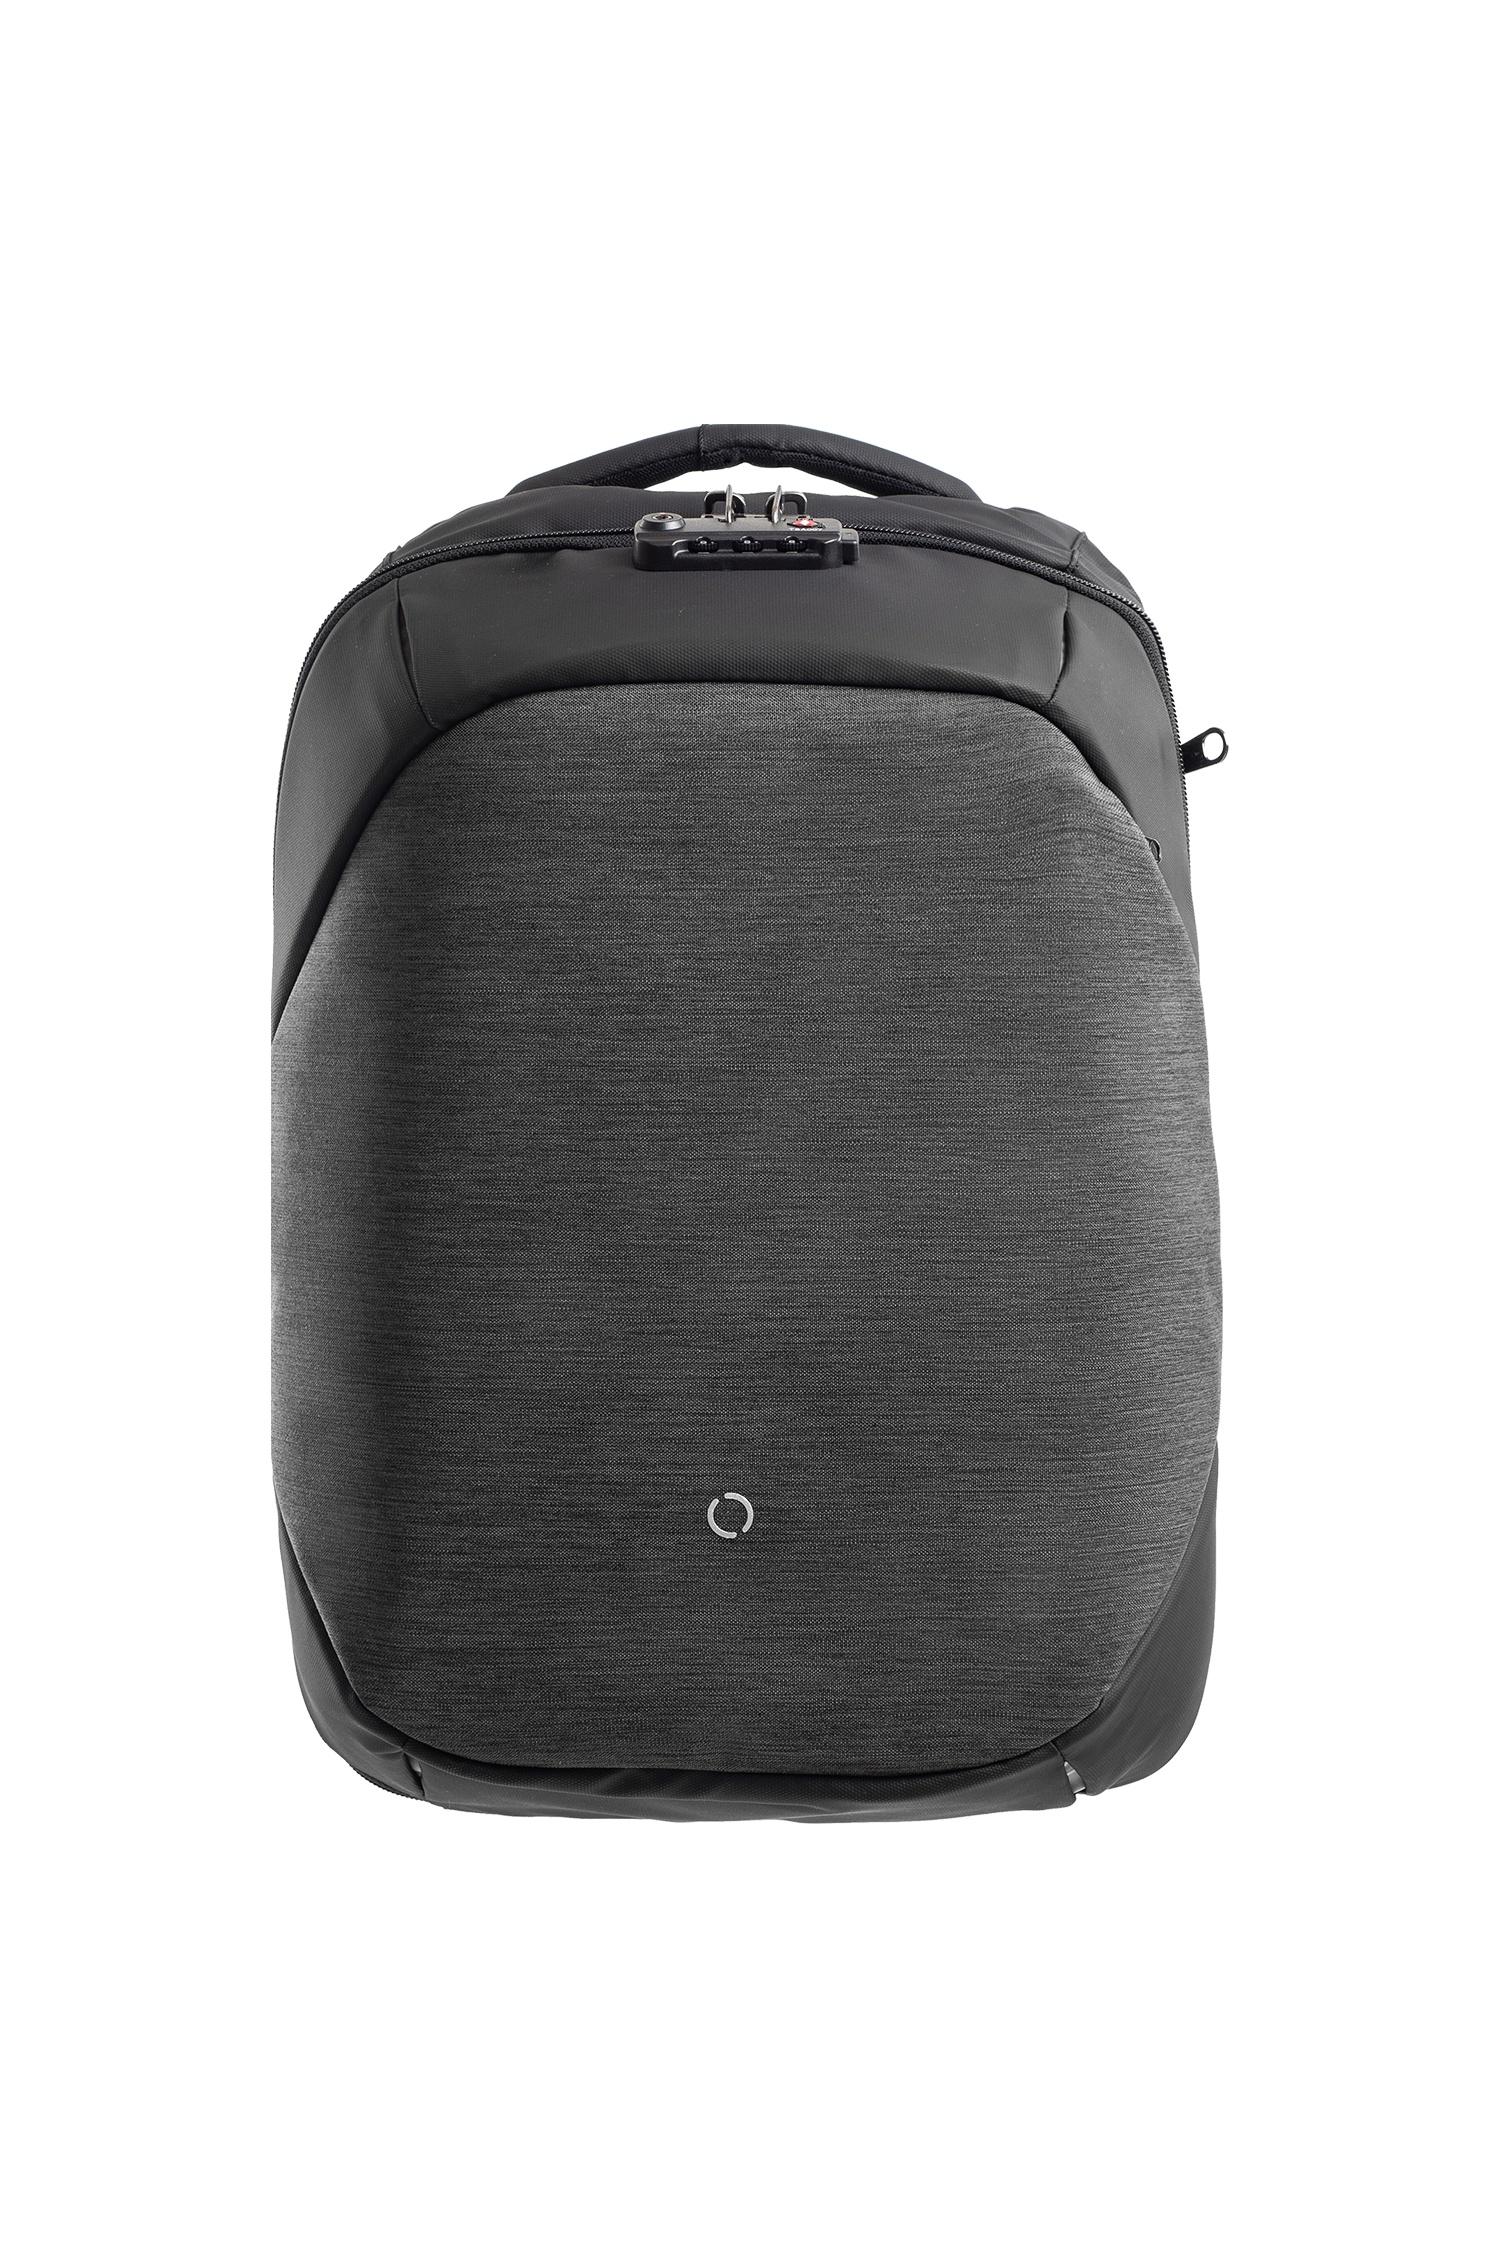 Рюкзак Korin рюкзак korin design clickpack gray серый